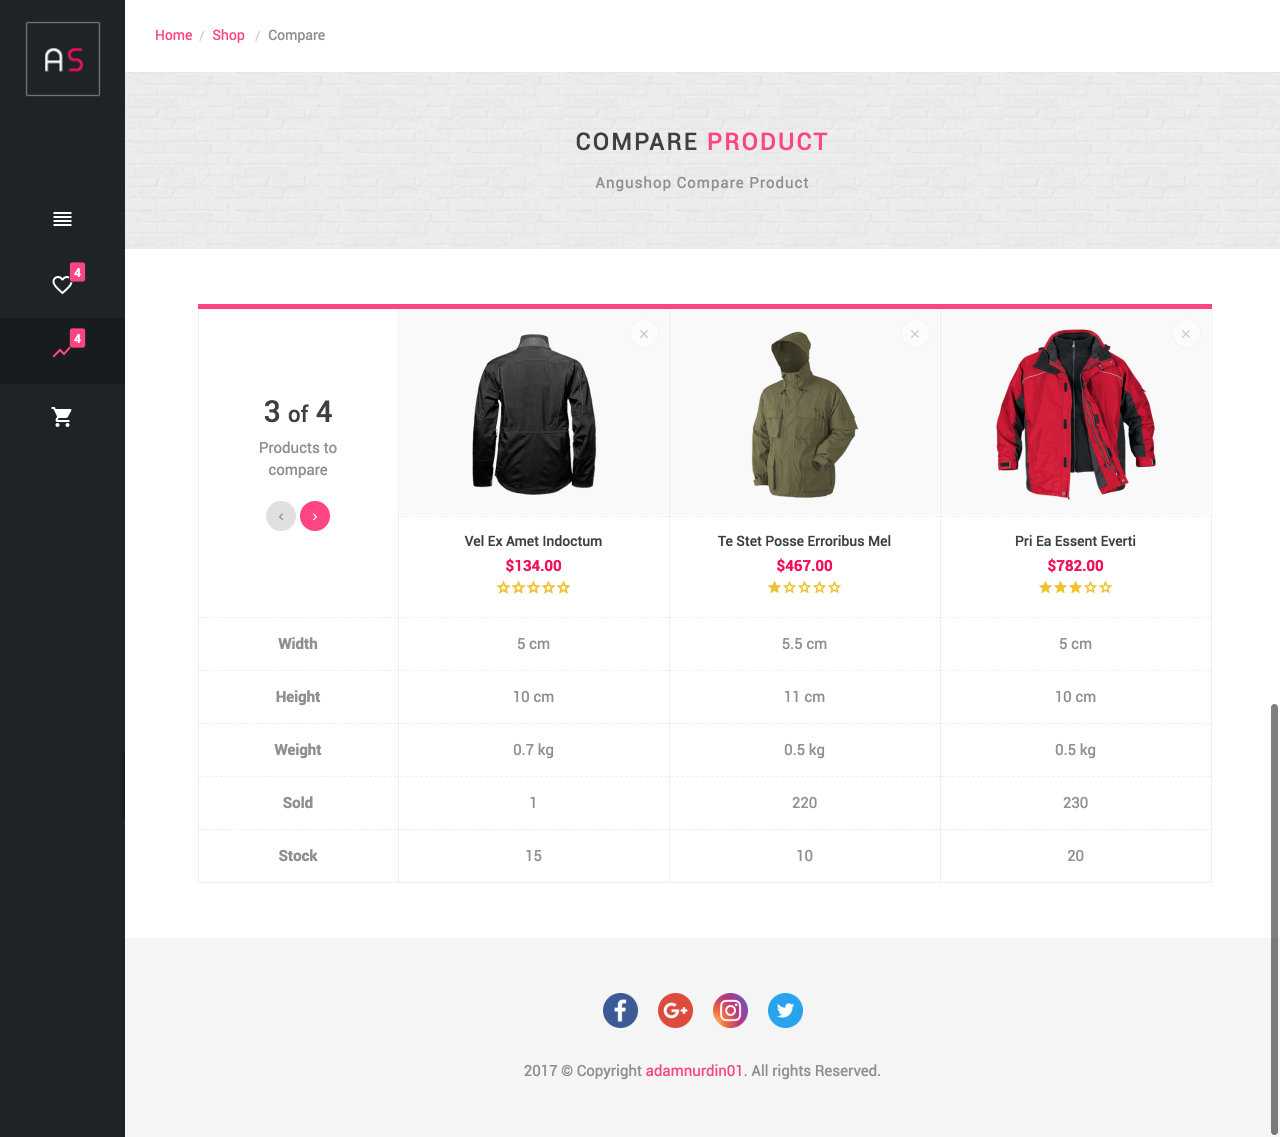 Angushop - Angular 8 Shop Template Material Design